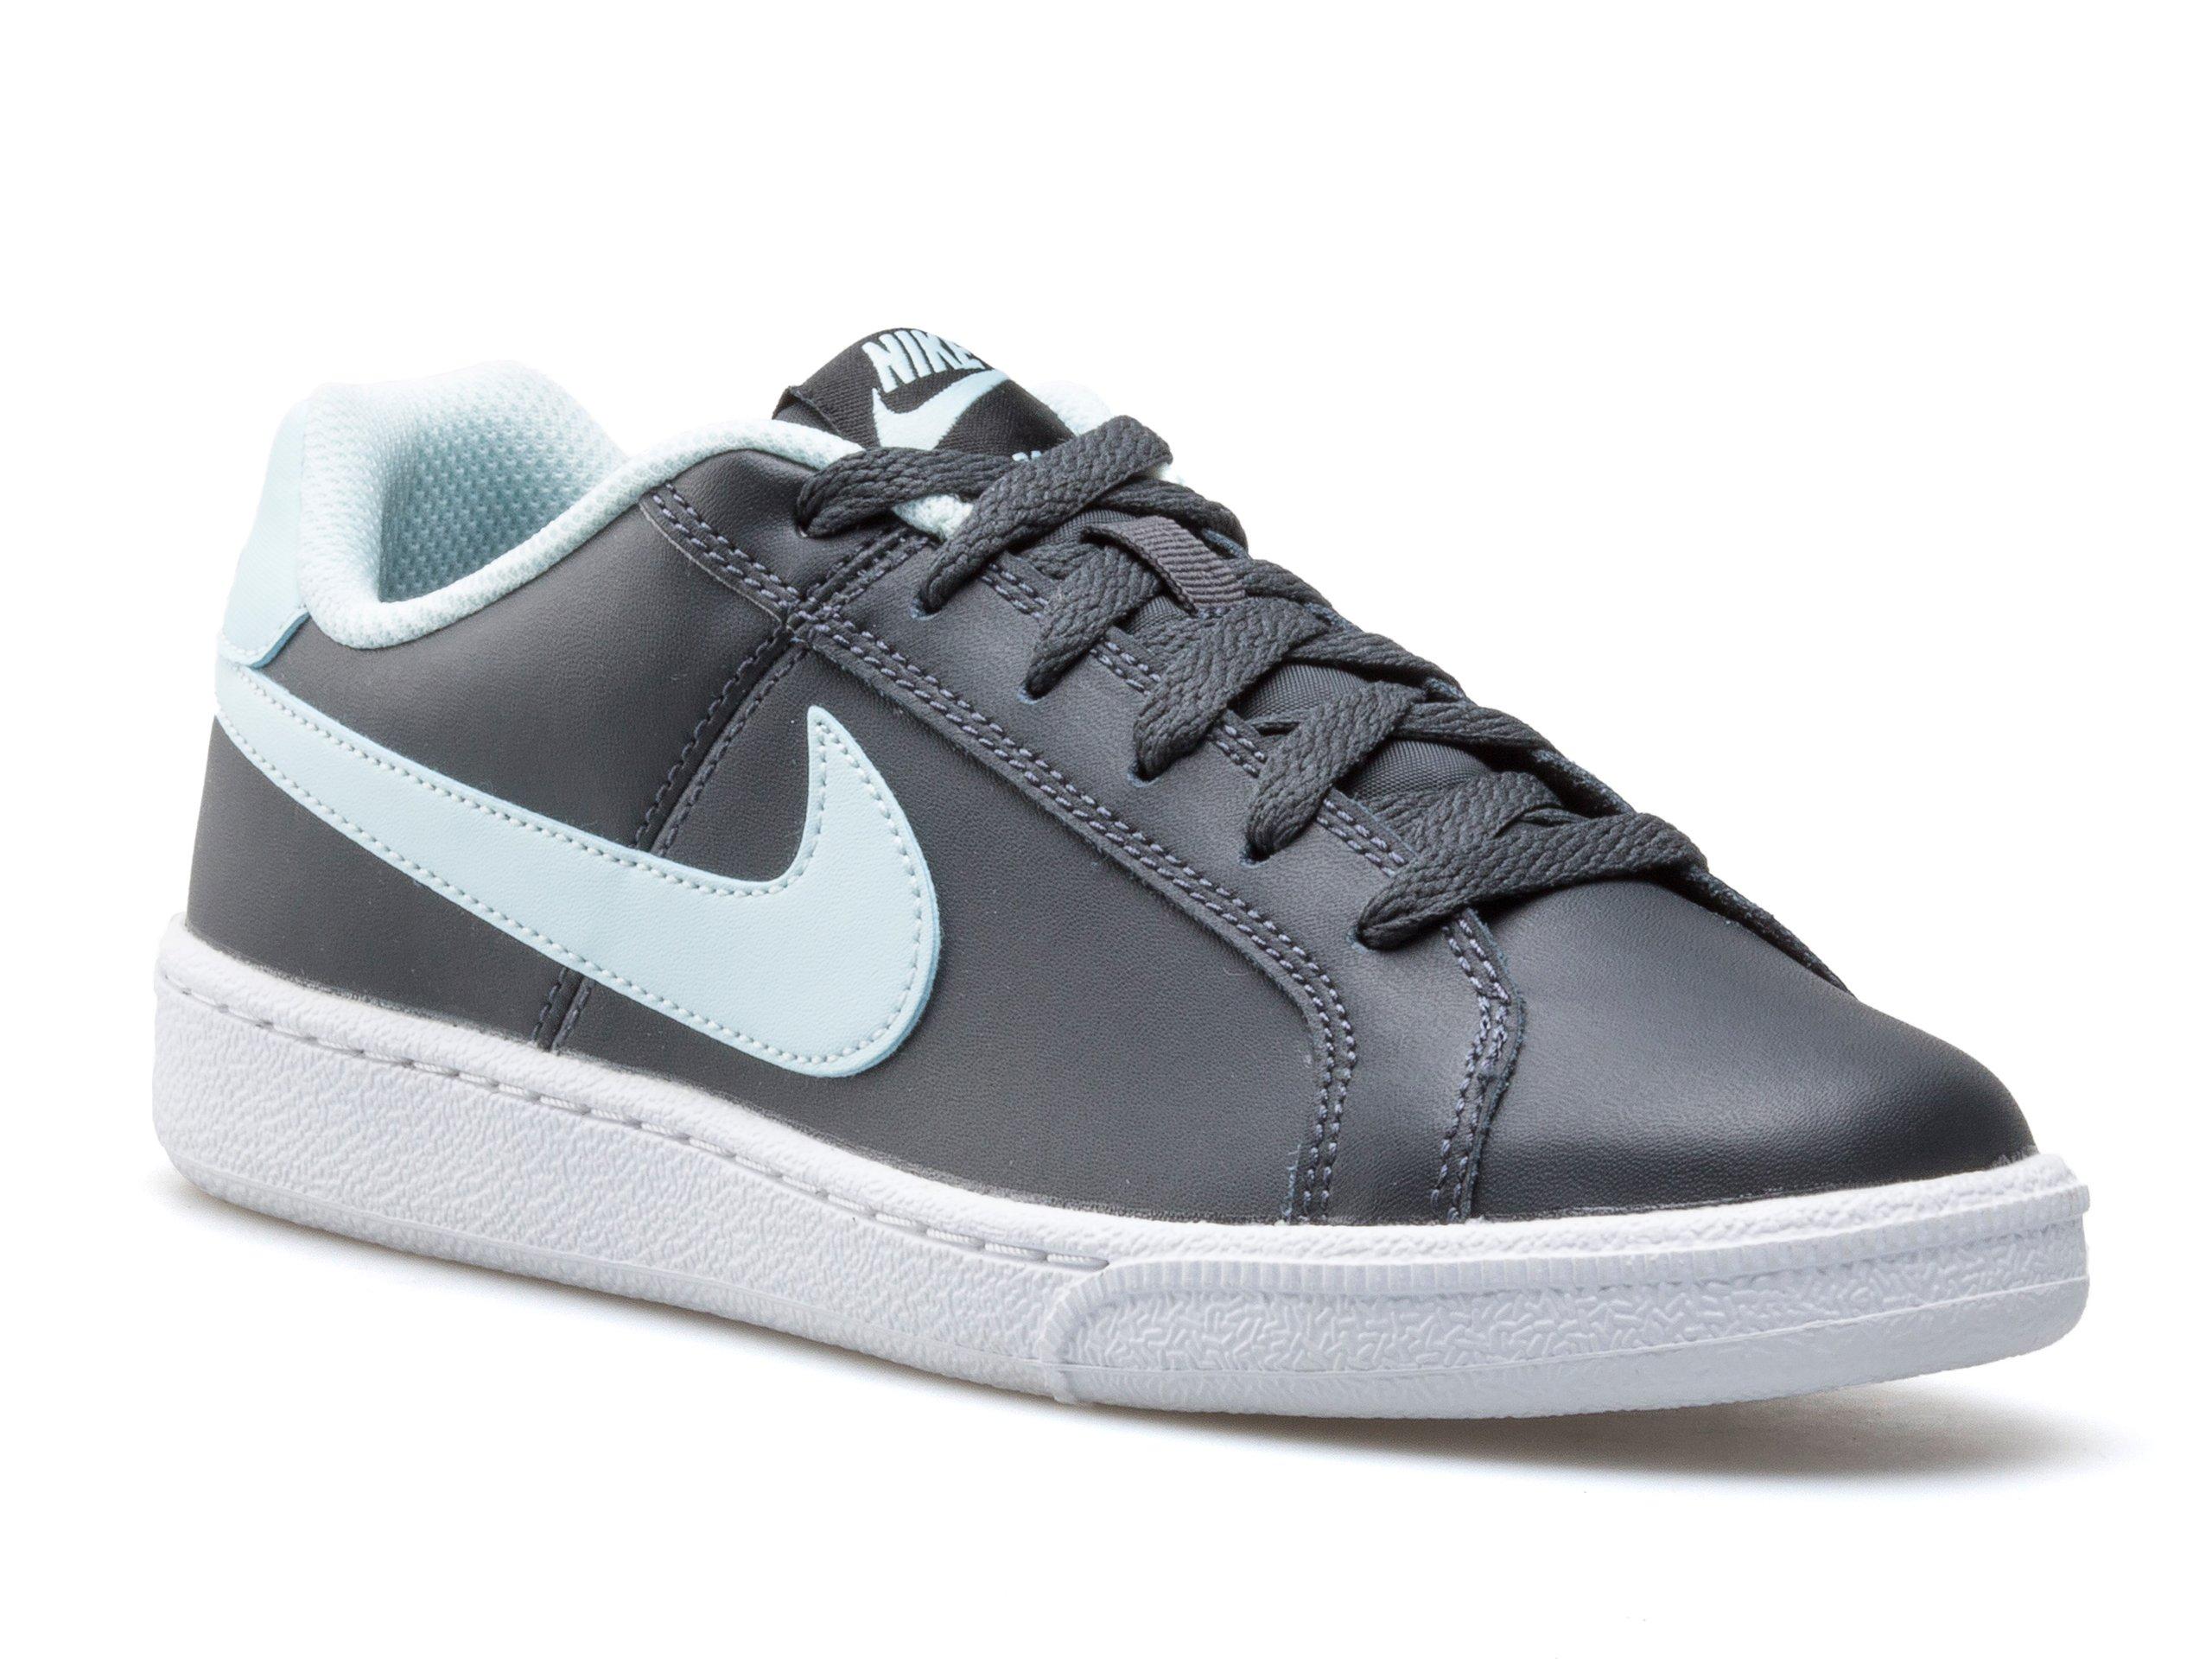 R. 36 Buty Nike Court Royale 749867 109 Białe Ceny i